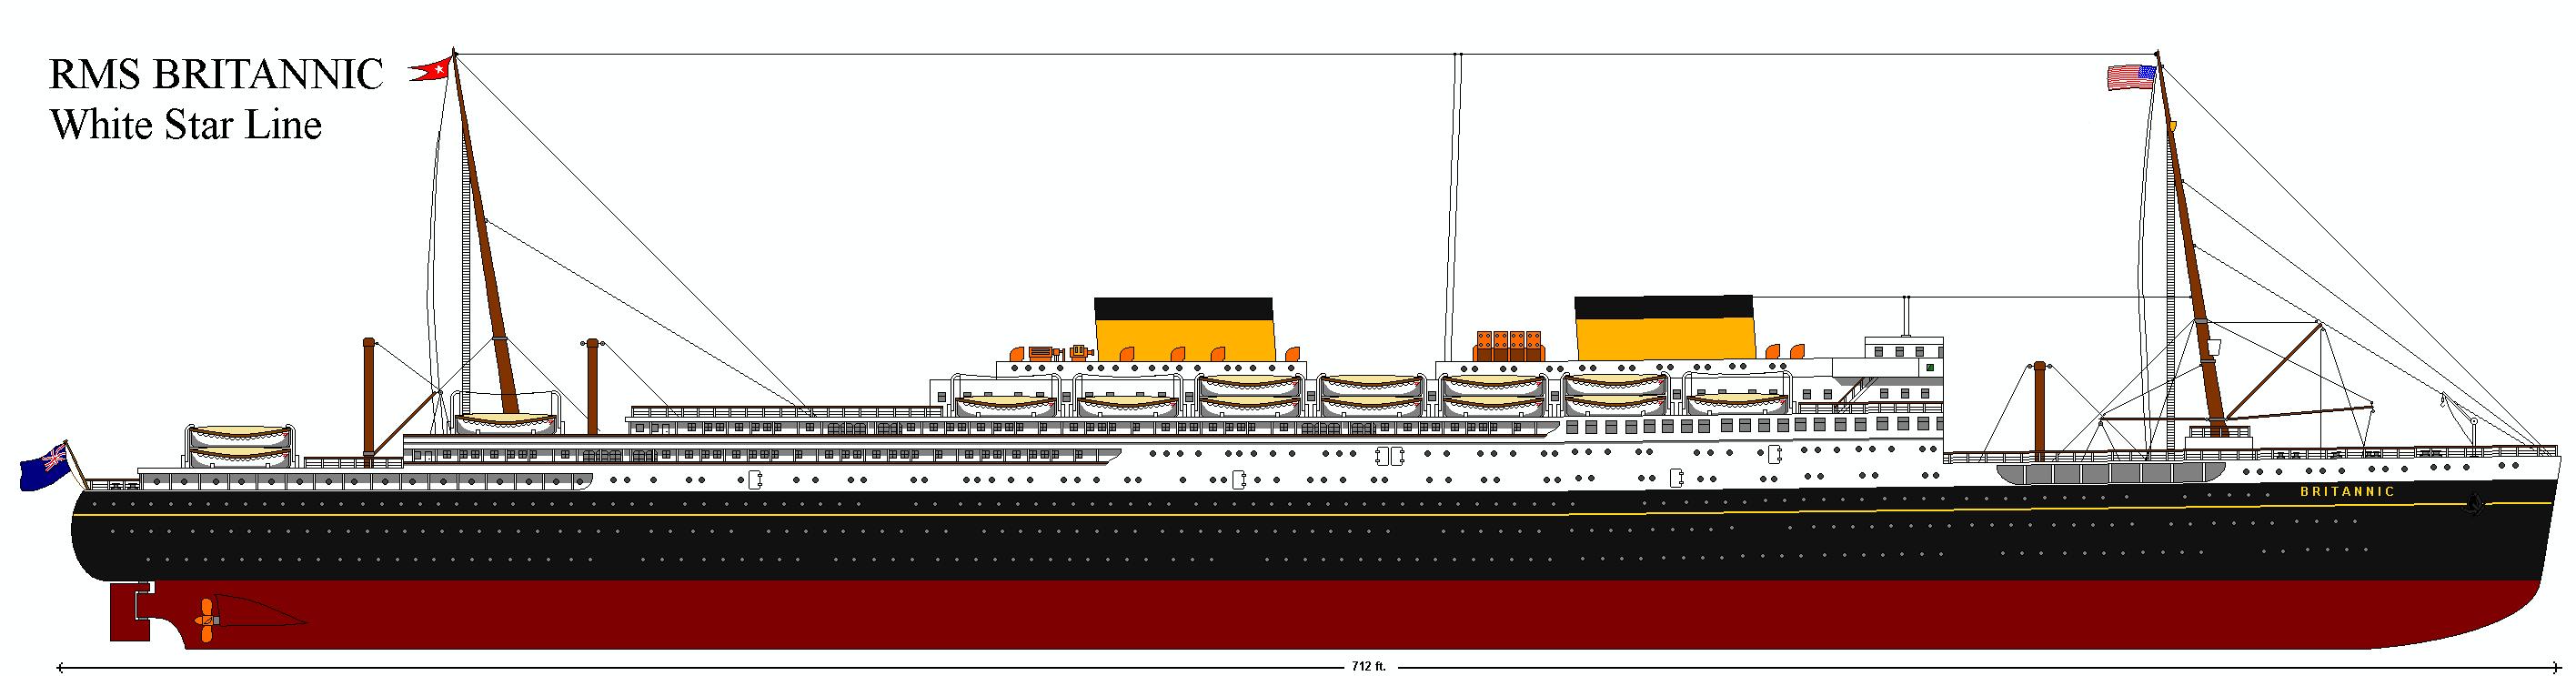 Файл:RMS Britannic (III).png — Википедия